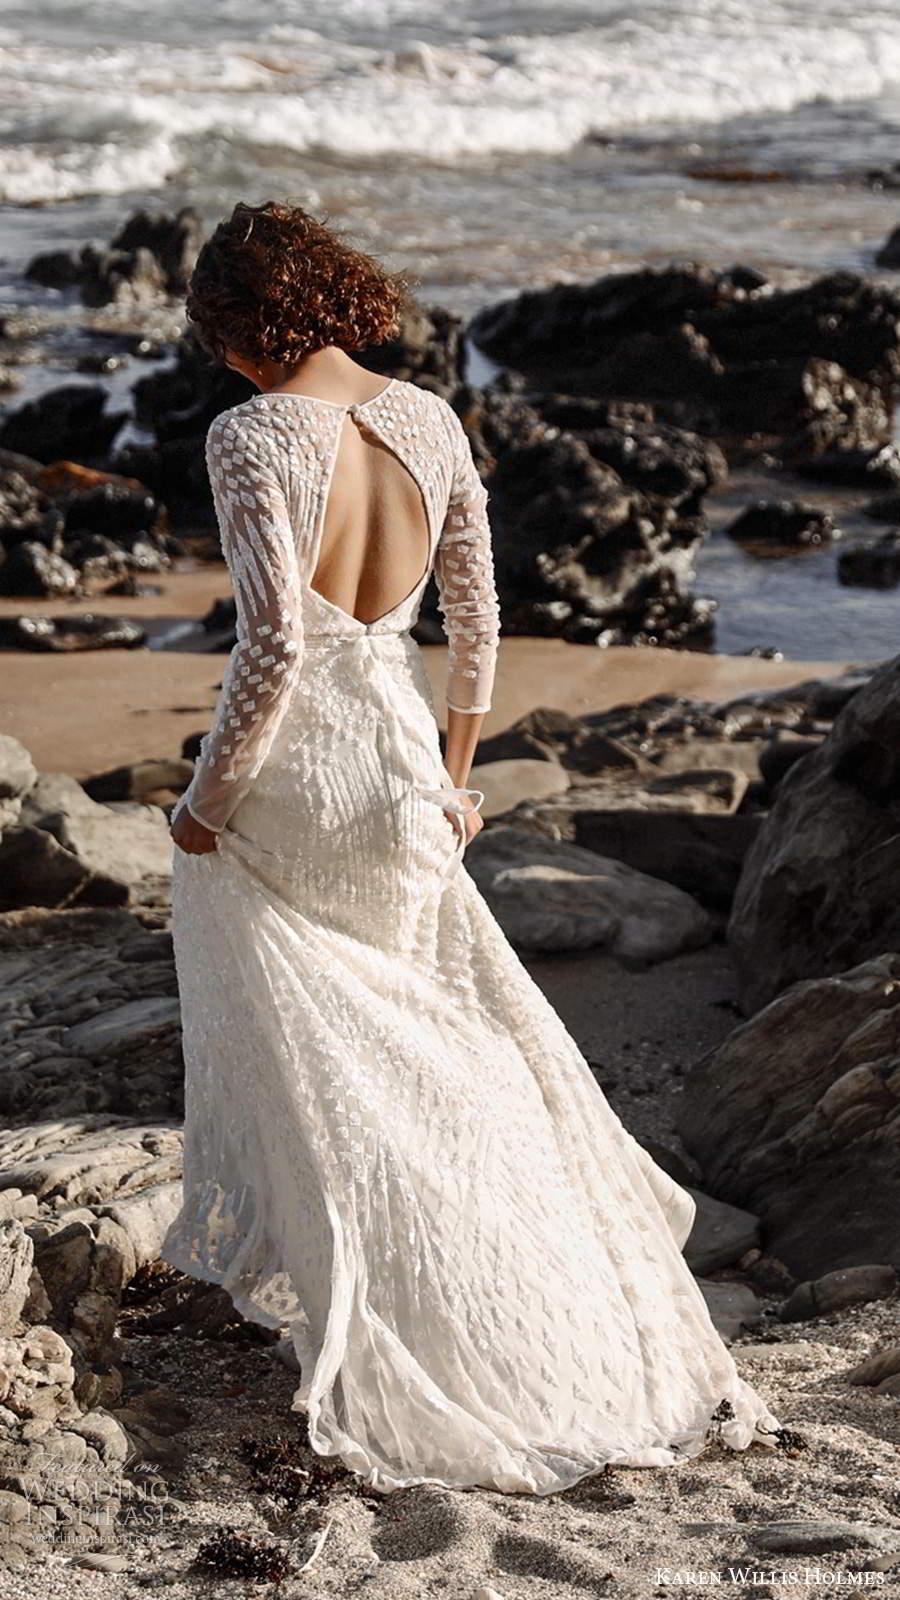 karen willis holmes 2020 bridal illusion long sleeves jewel neckline fully embellished sheath wedding dress keyhole back chapel train (1) bv